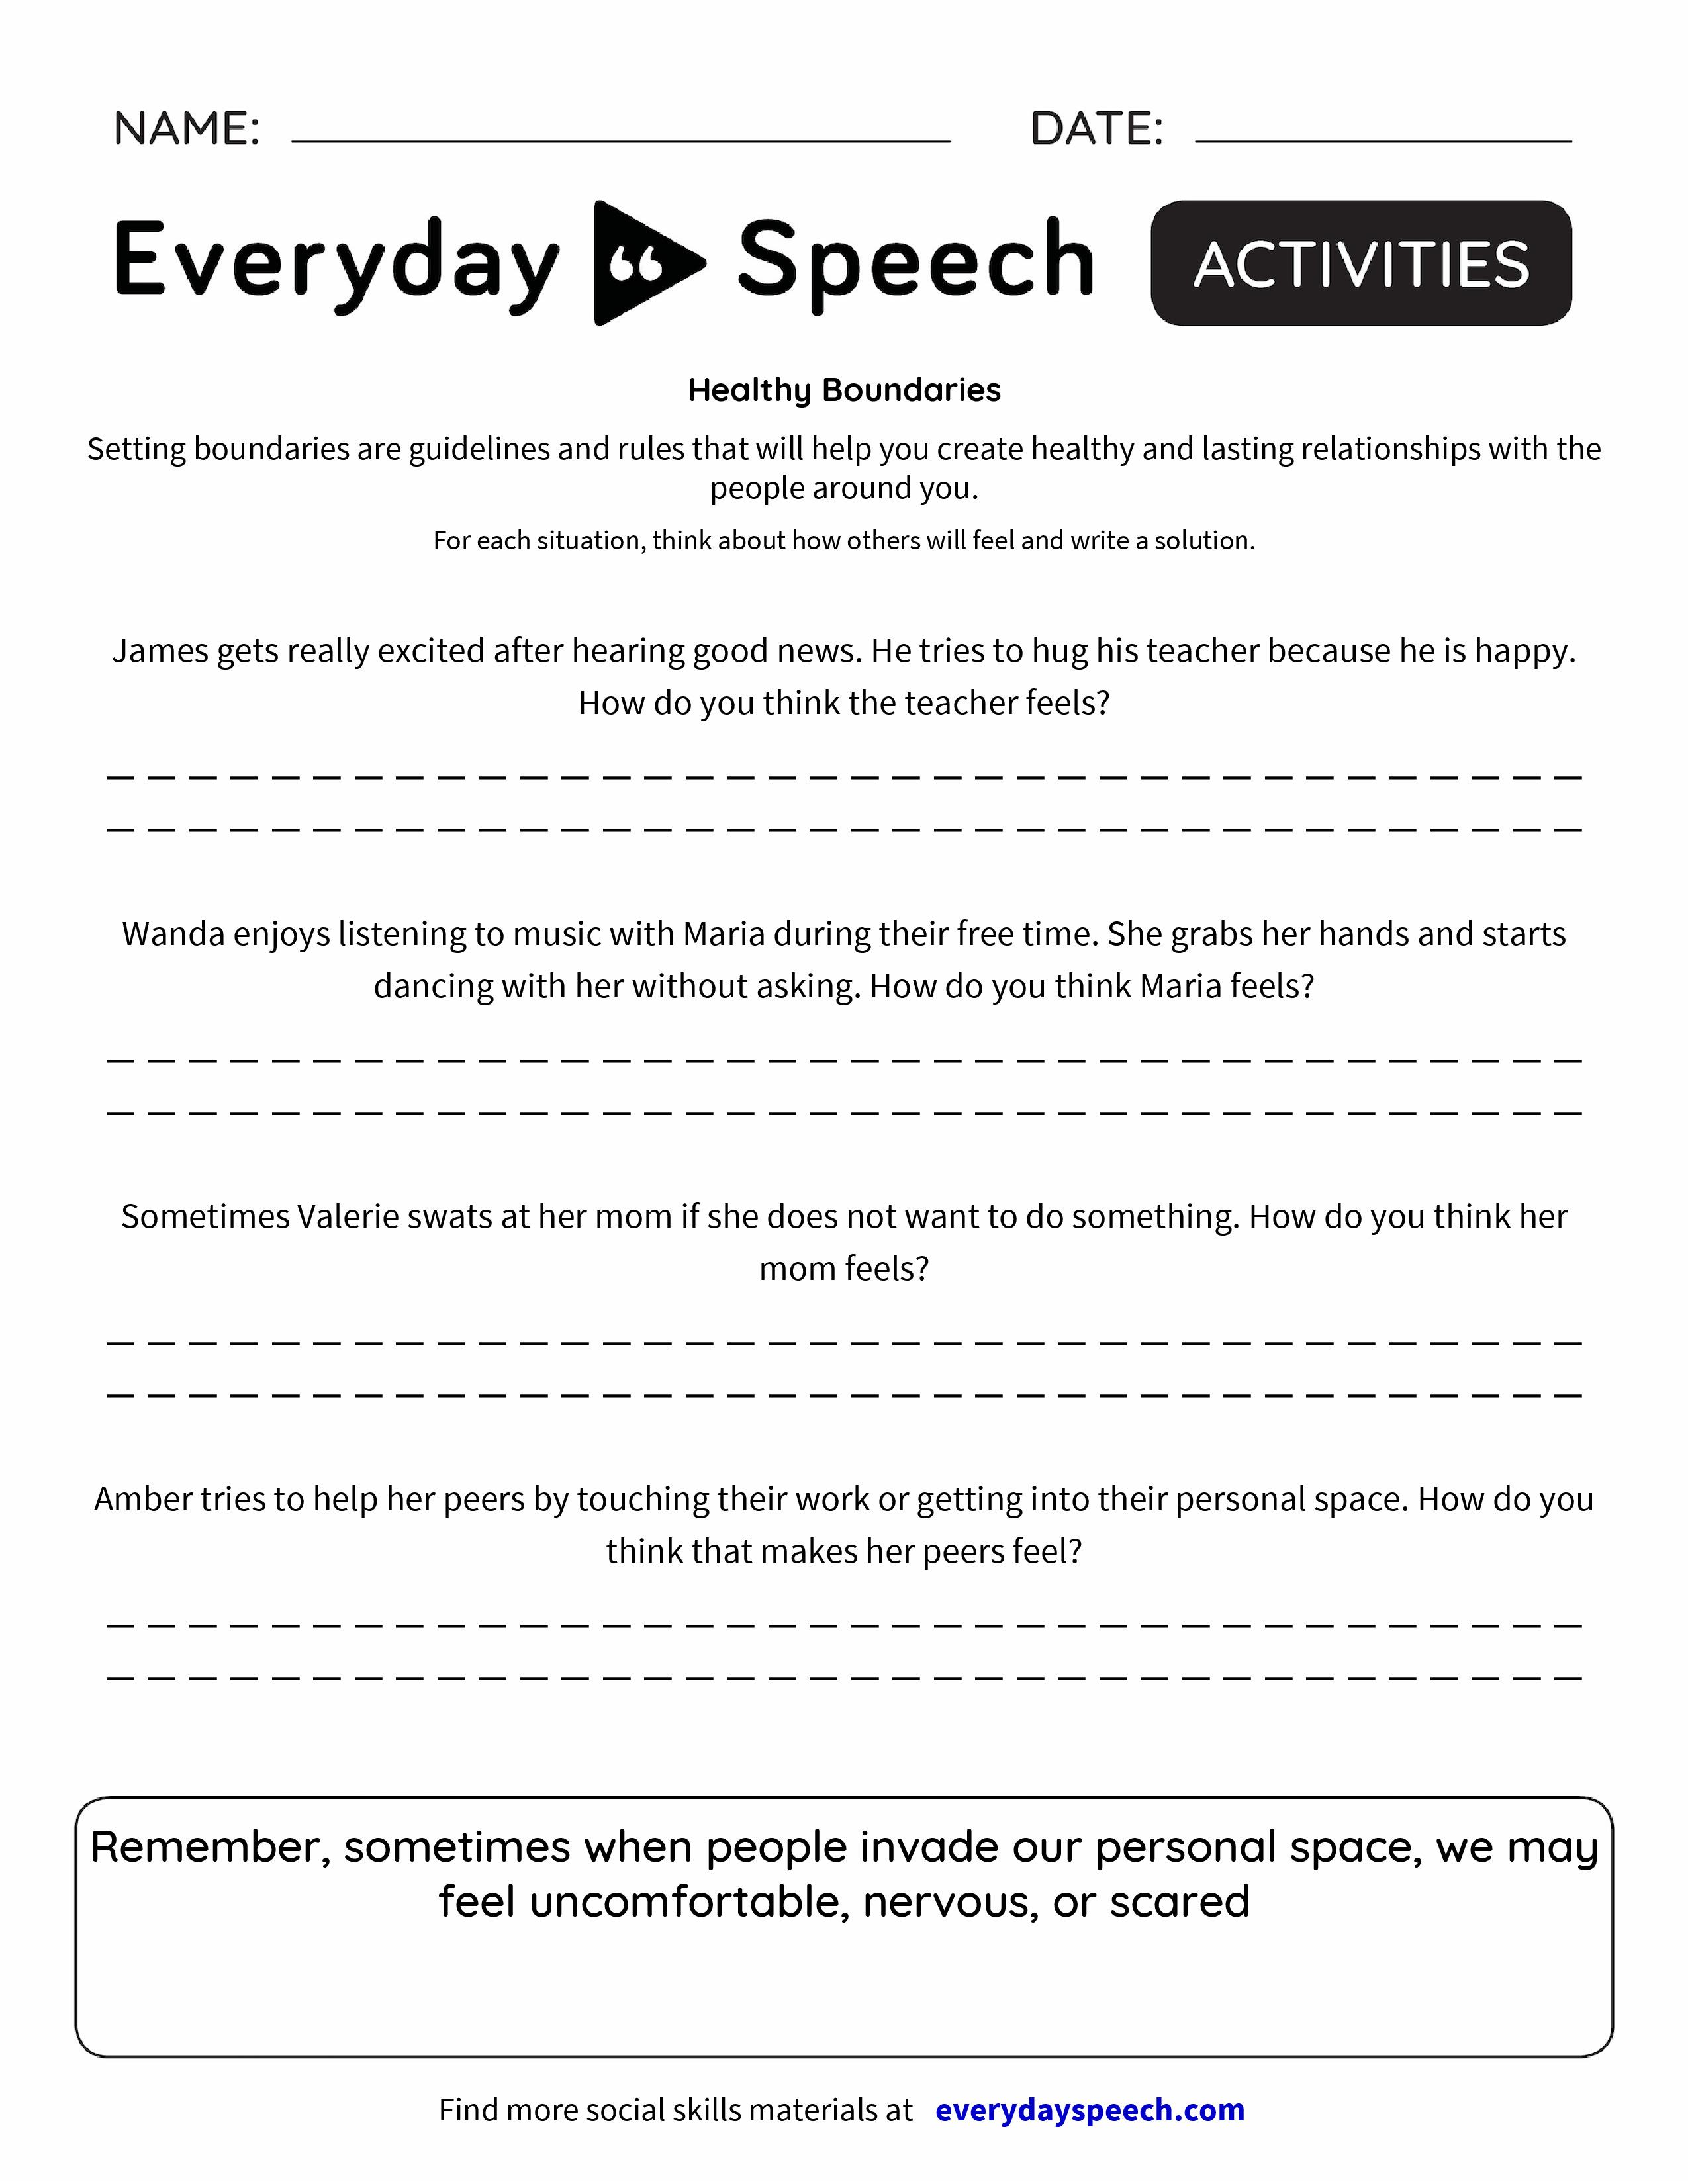 Worksheets Setting Personal Boundaries Worksheet boundaries in relationships worksheets pdf healthy everyday speech speech